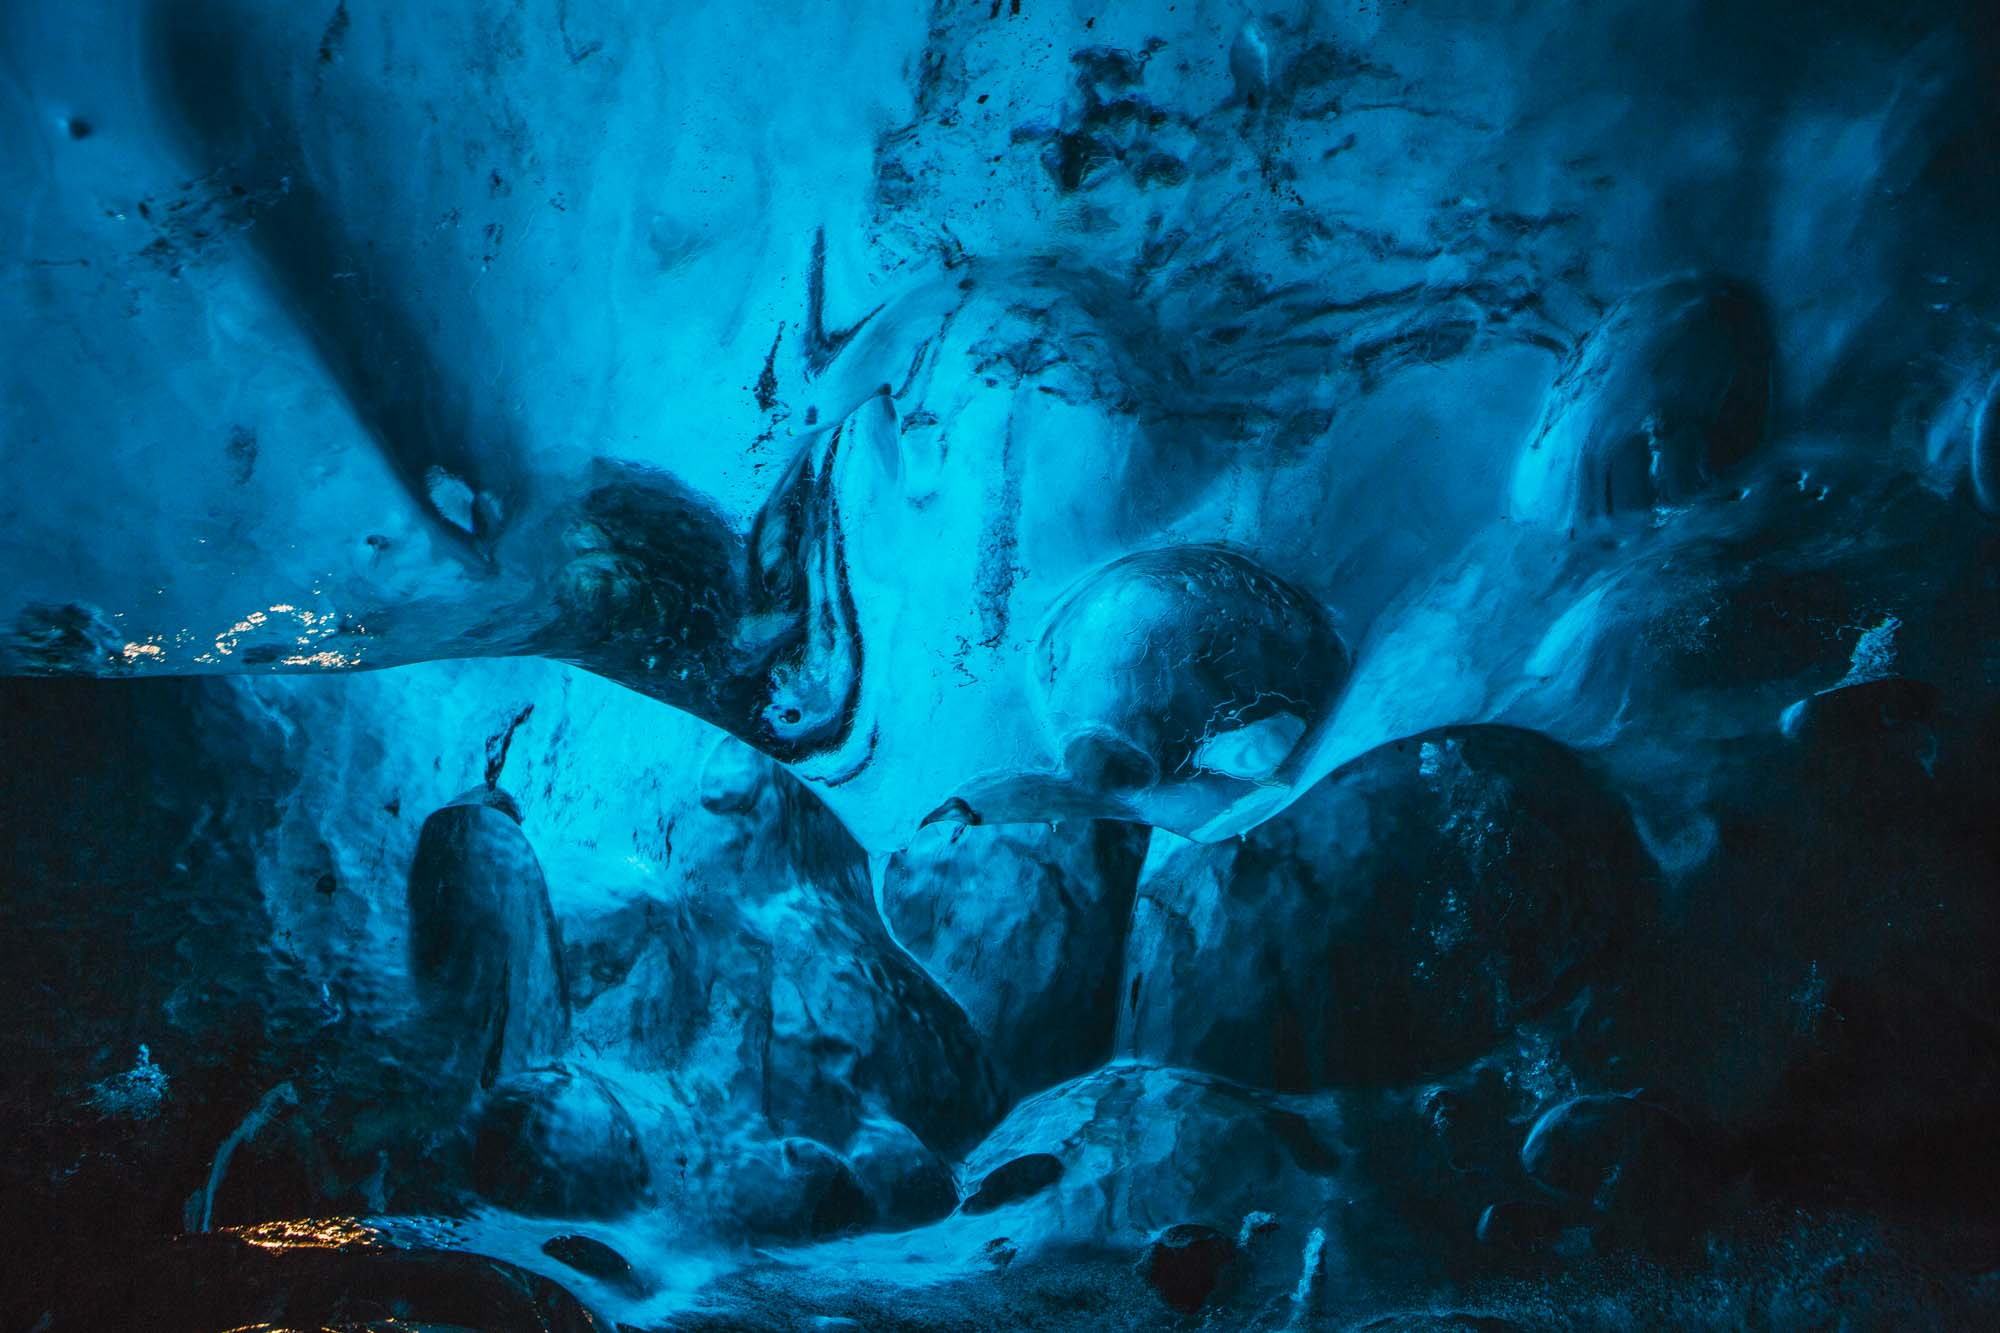 Ice Cave Iceland, Vatnajökull